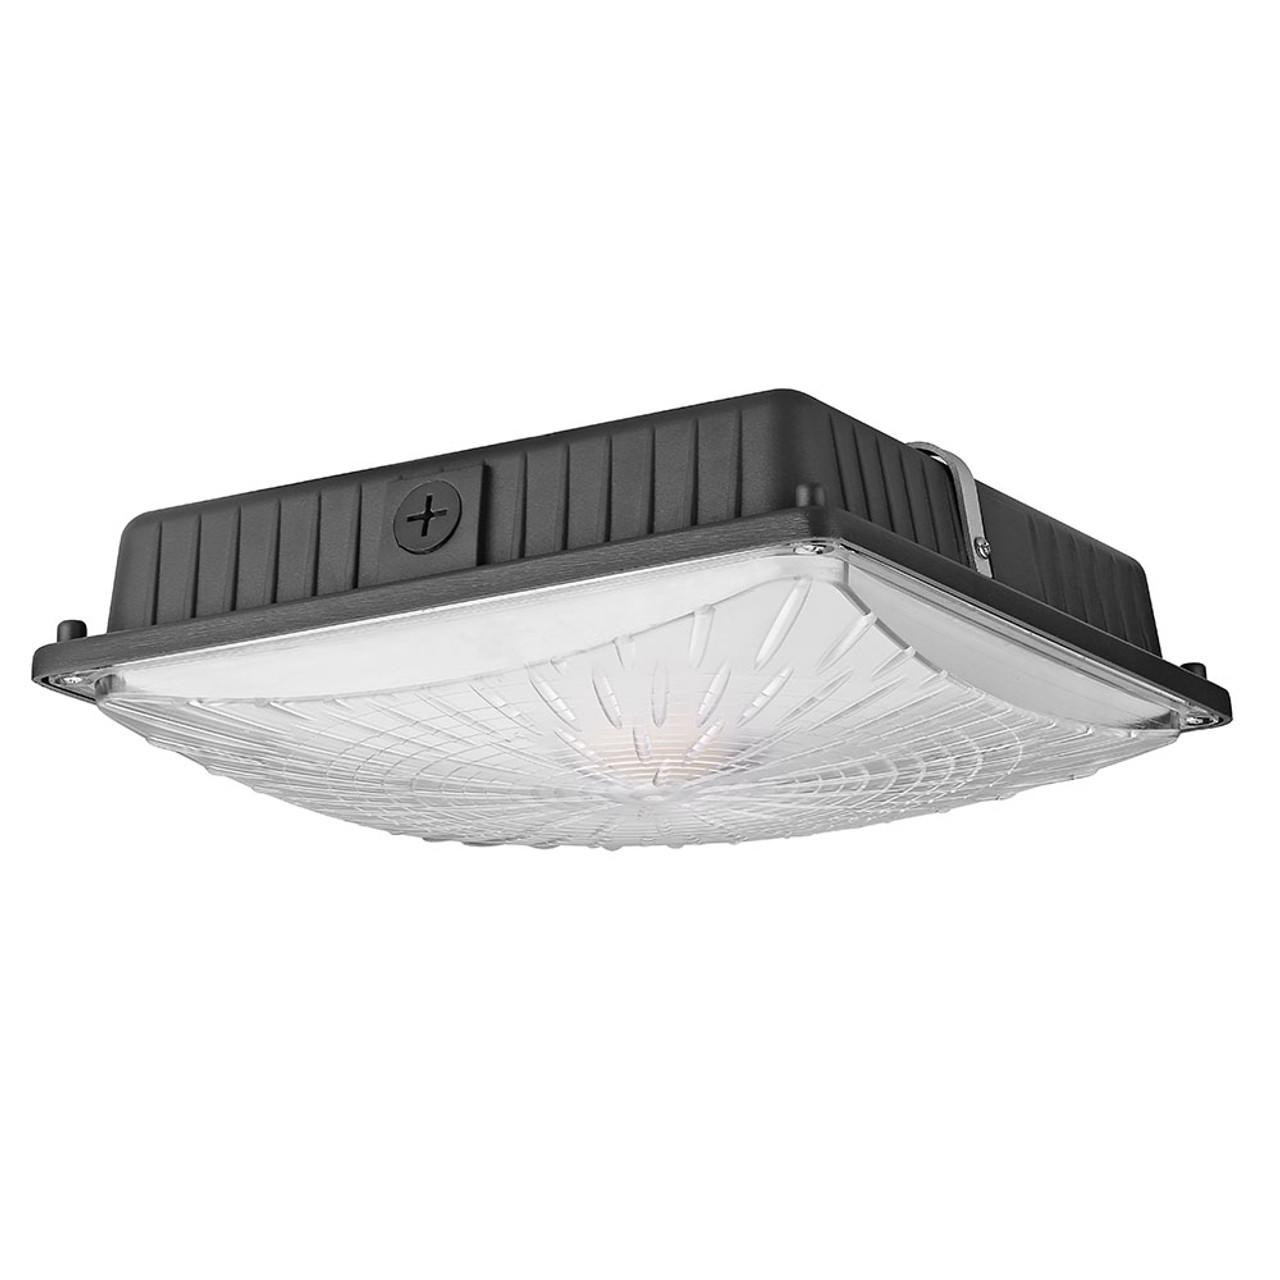 Slim Line Canopy LED Light